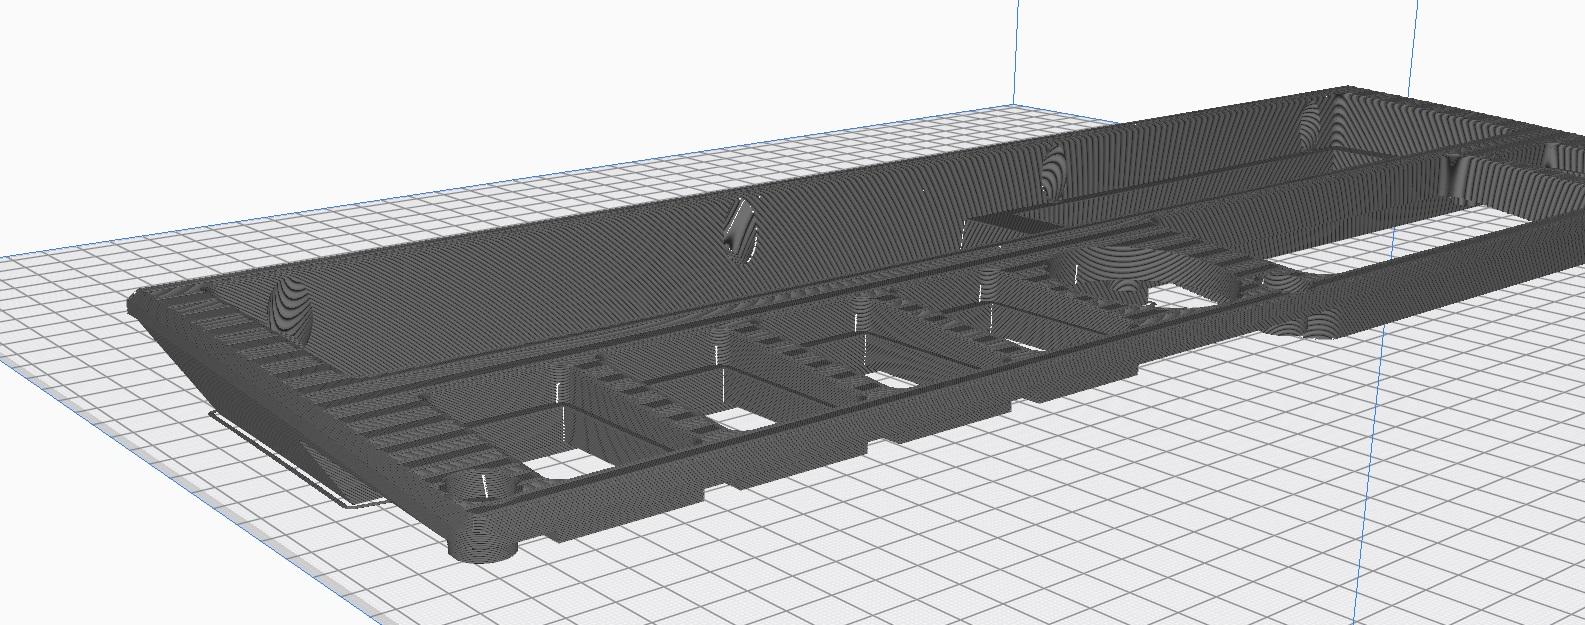 demo surface.jpg